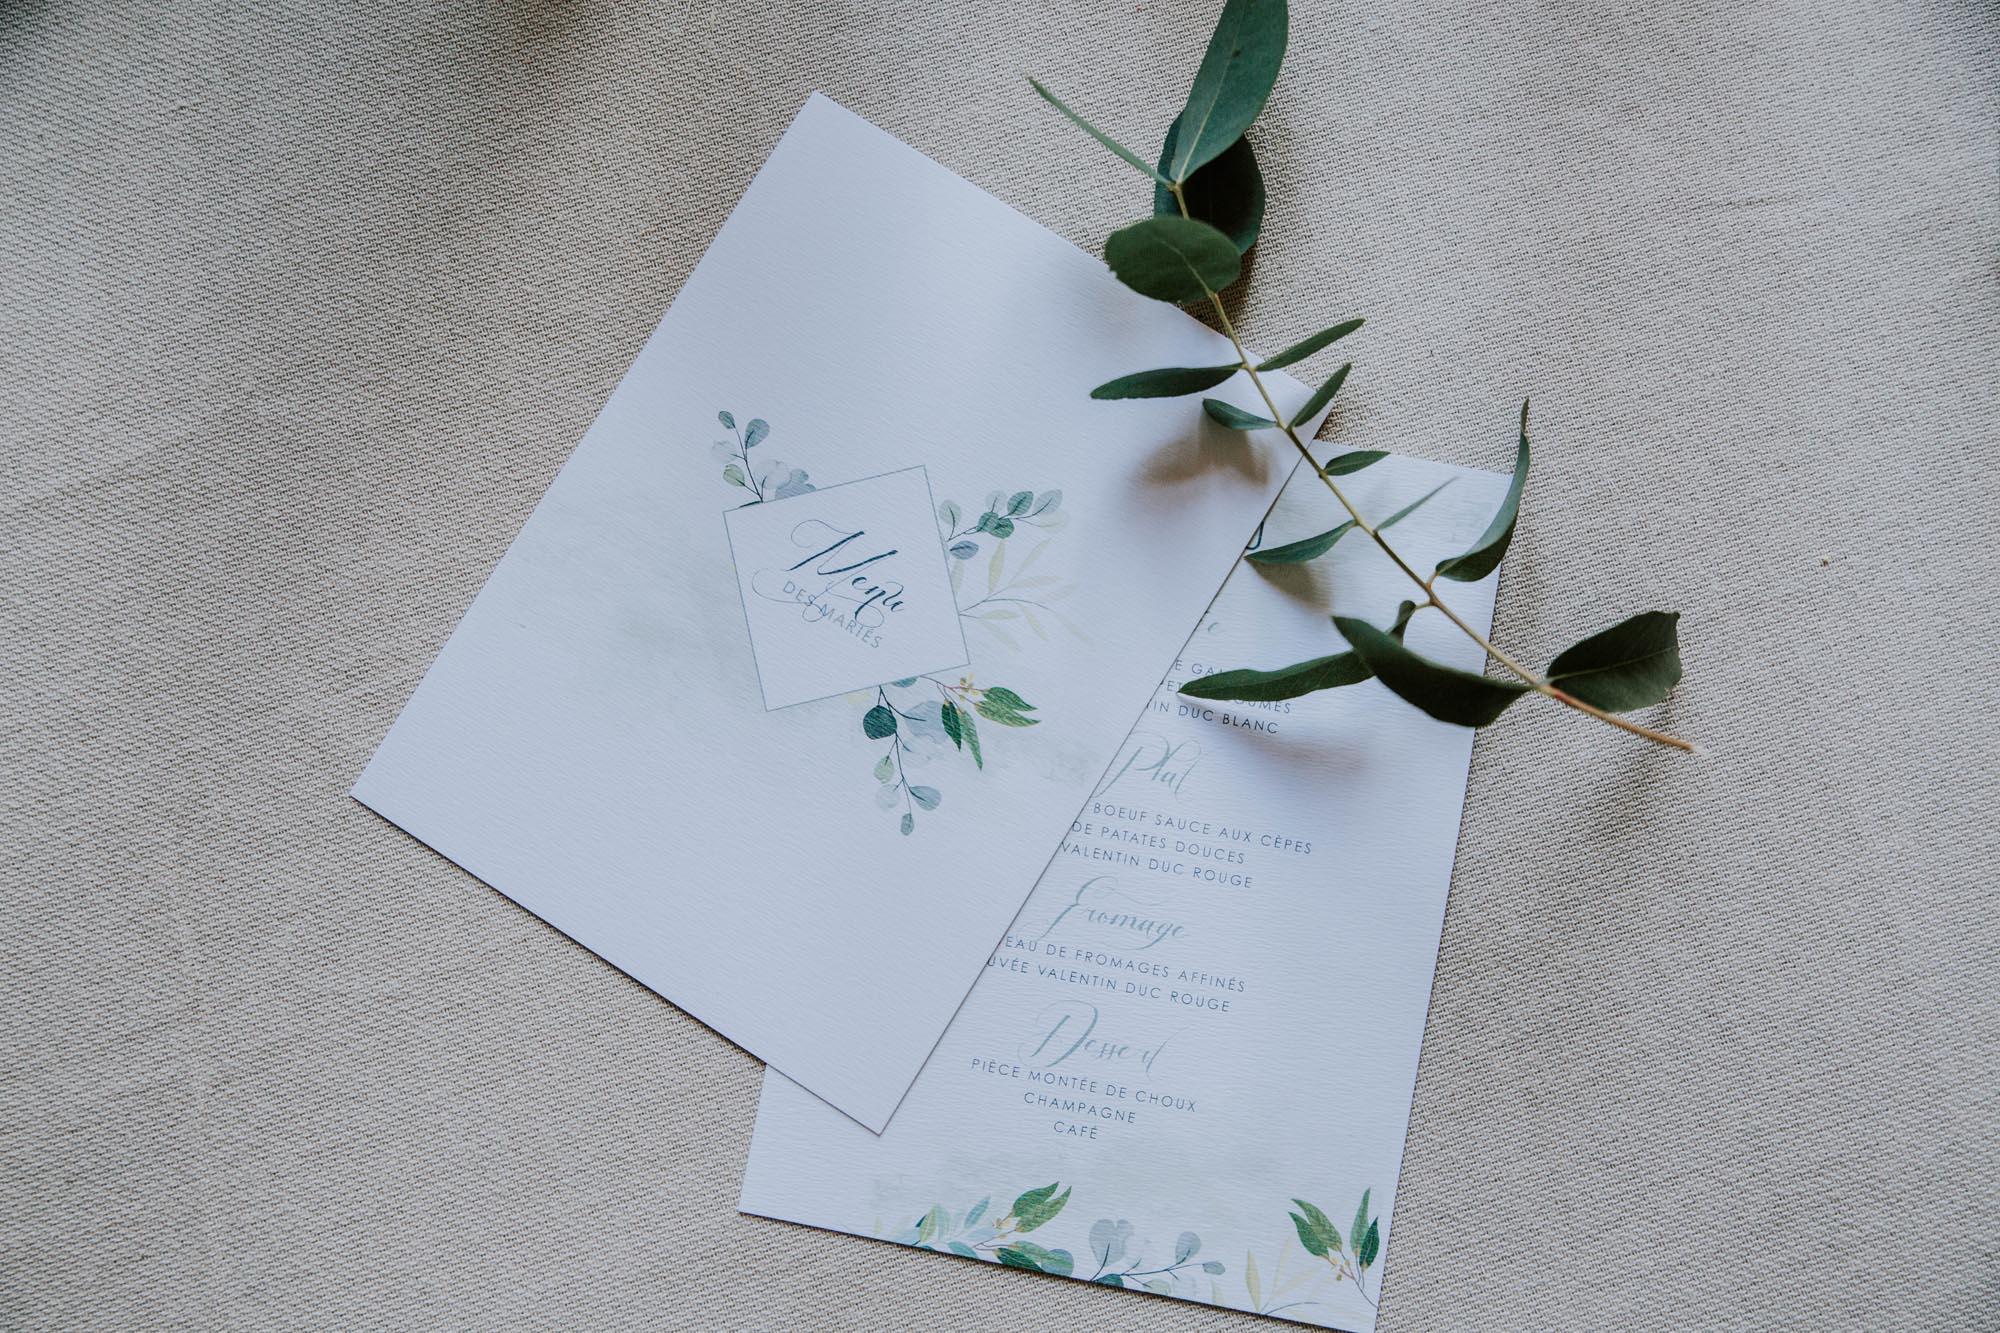 Menu table mariage végétal feuille eucalyptus